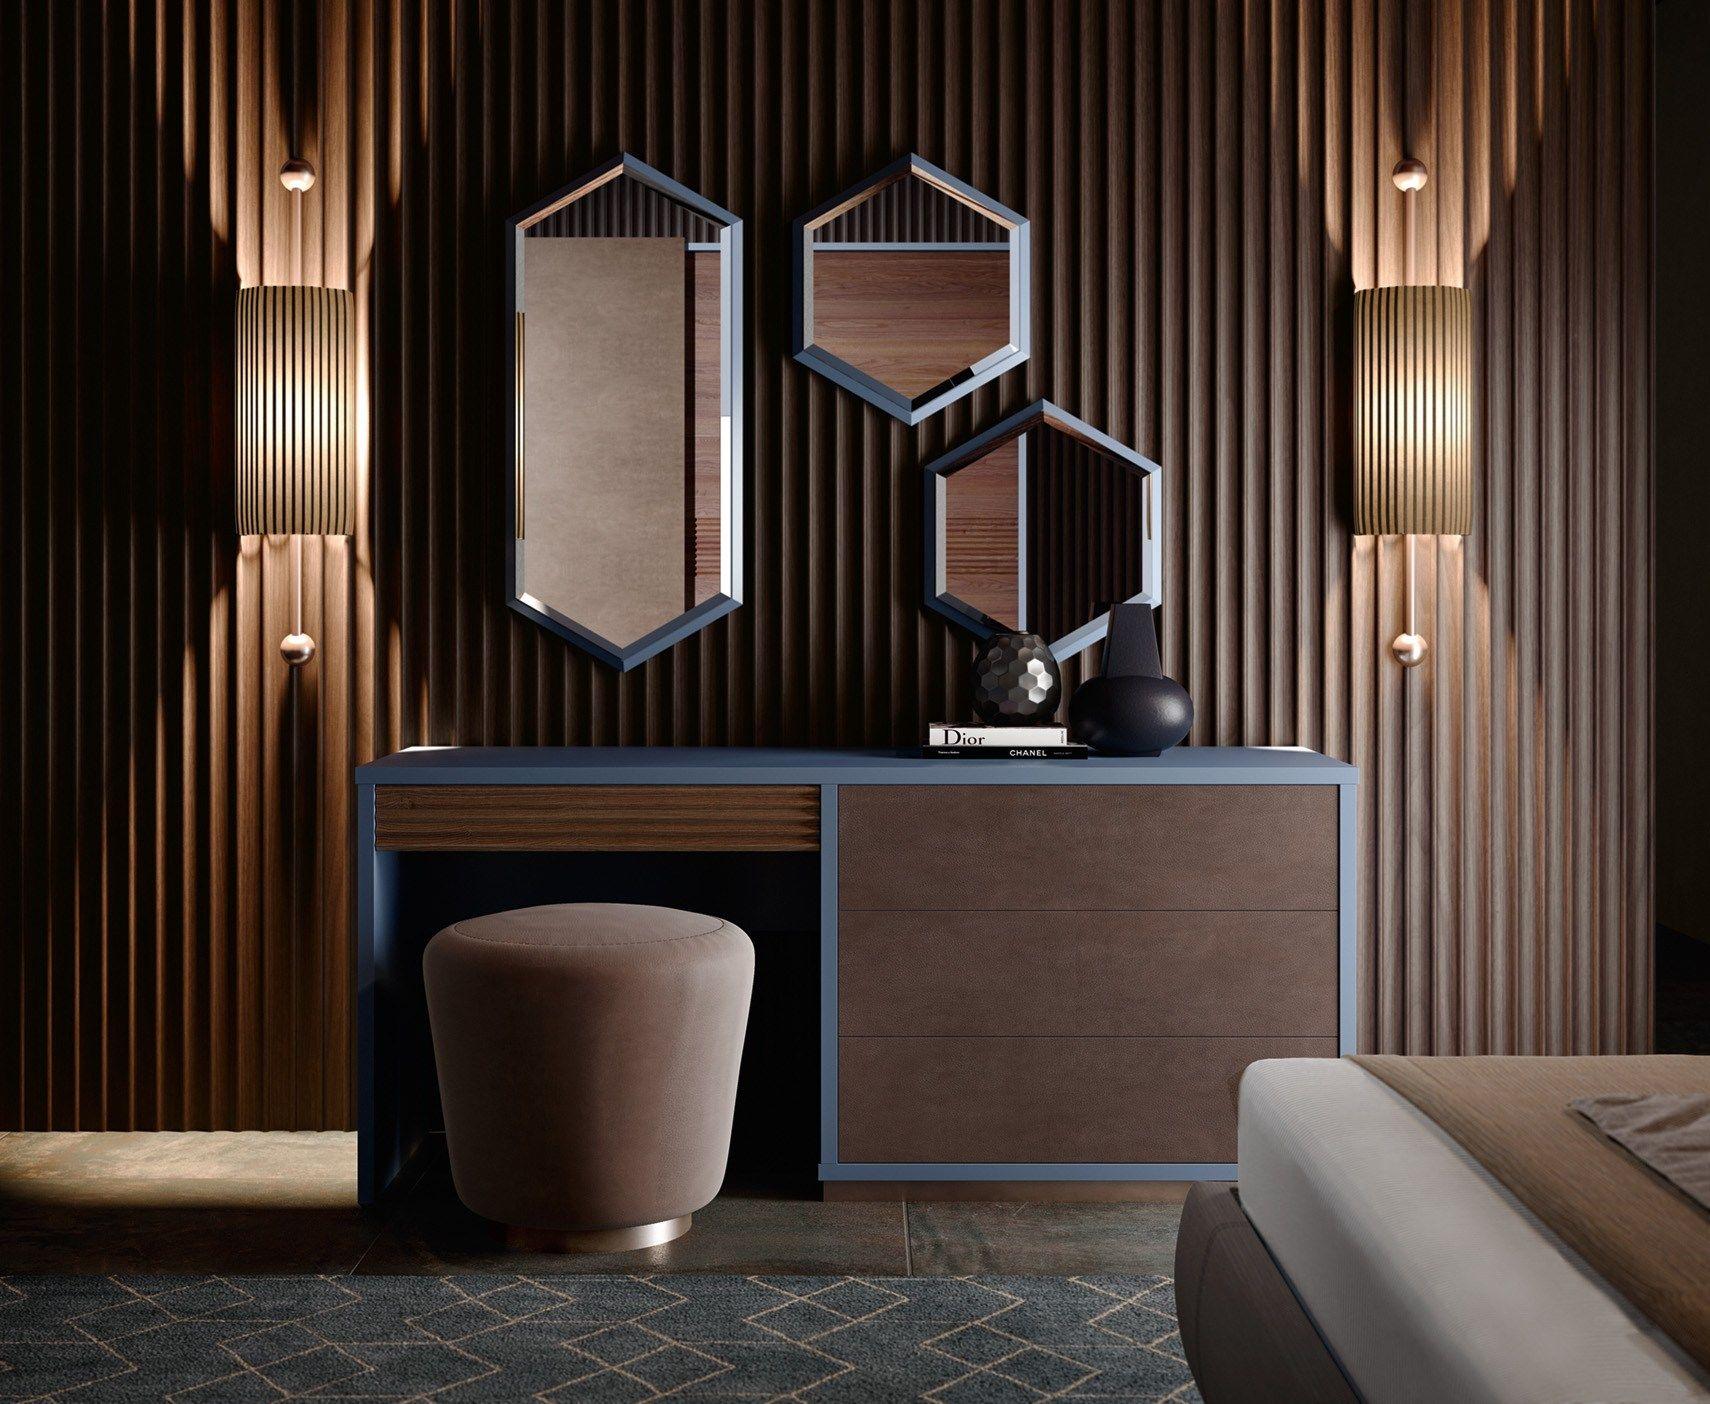 prisma miroir mural by caroti design ni ko design. Black Bedroom Furniture Sets. Home Design Ideas